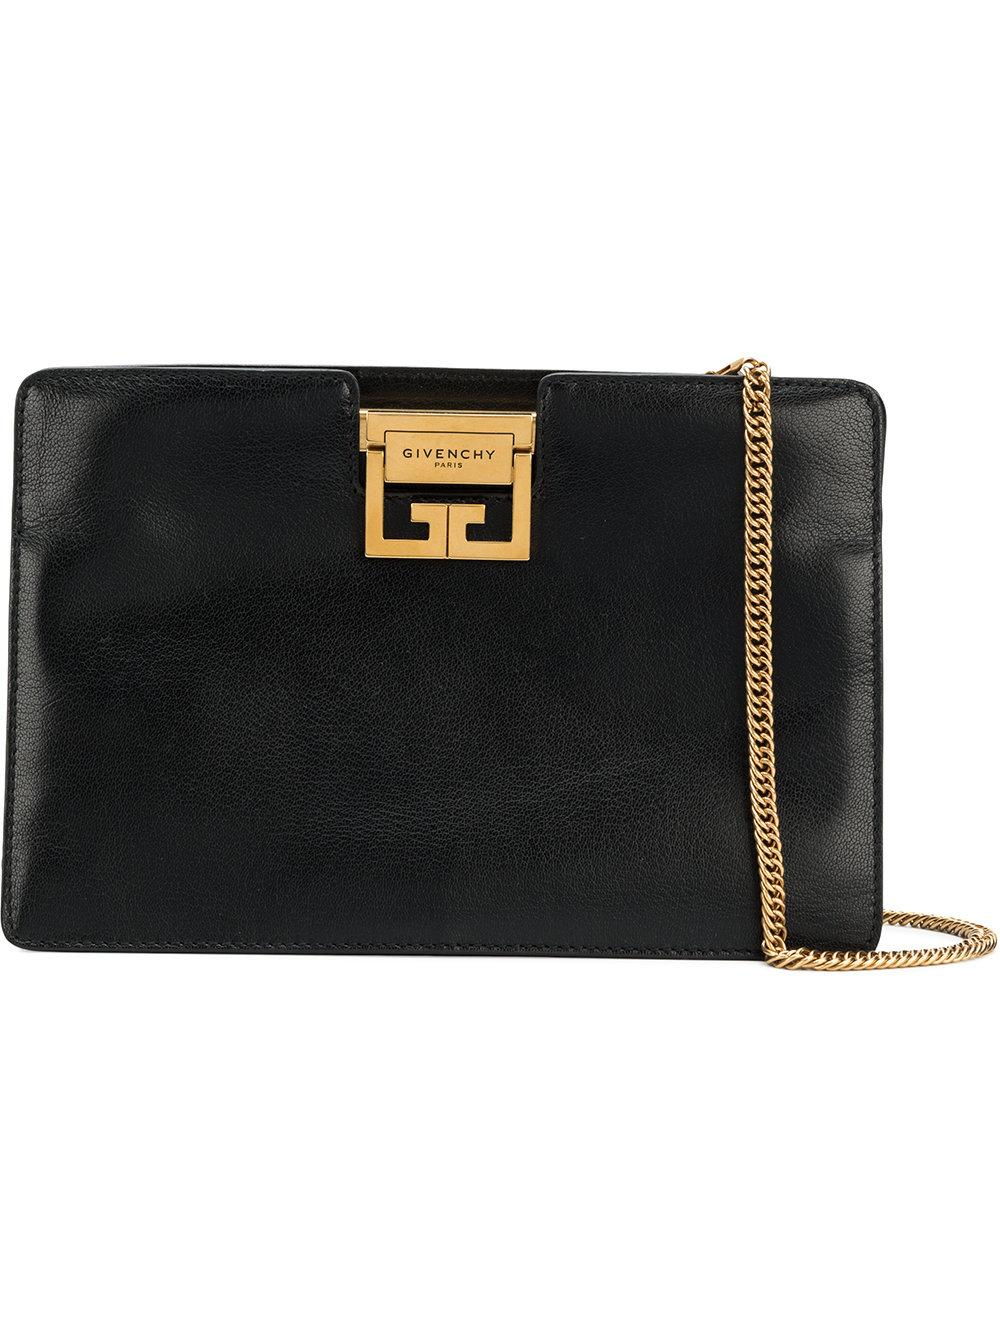 Givenchy Gv3 Frame Bag - Black